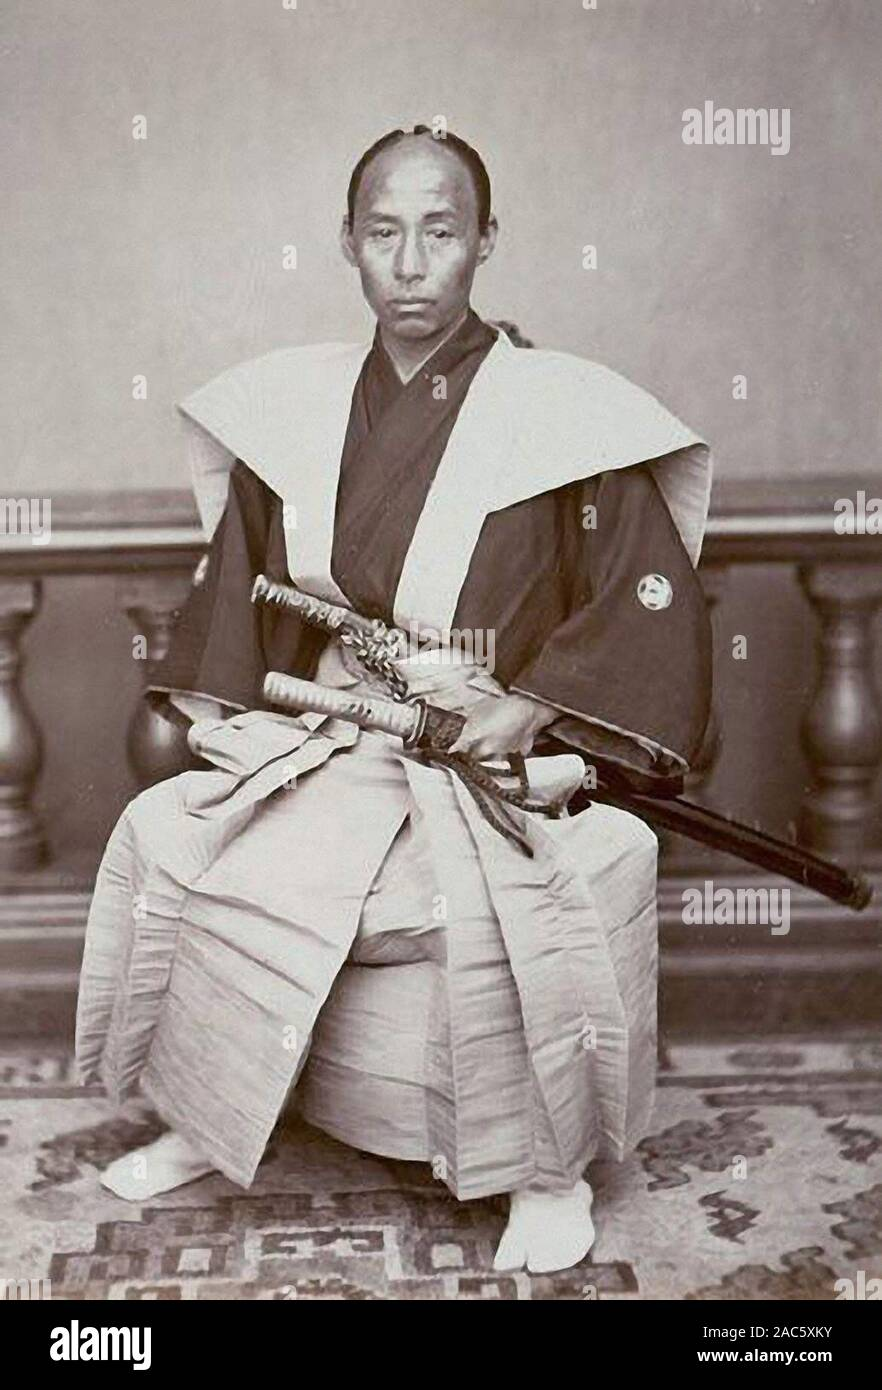 Samurai On Vintage Photograph From 19th Centuary Stock Photo Alamy